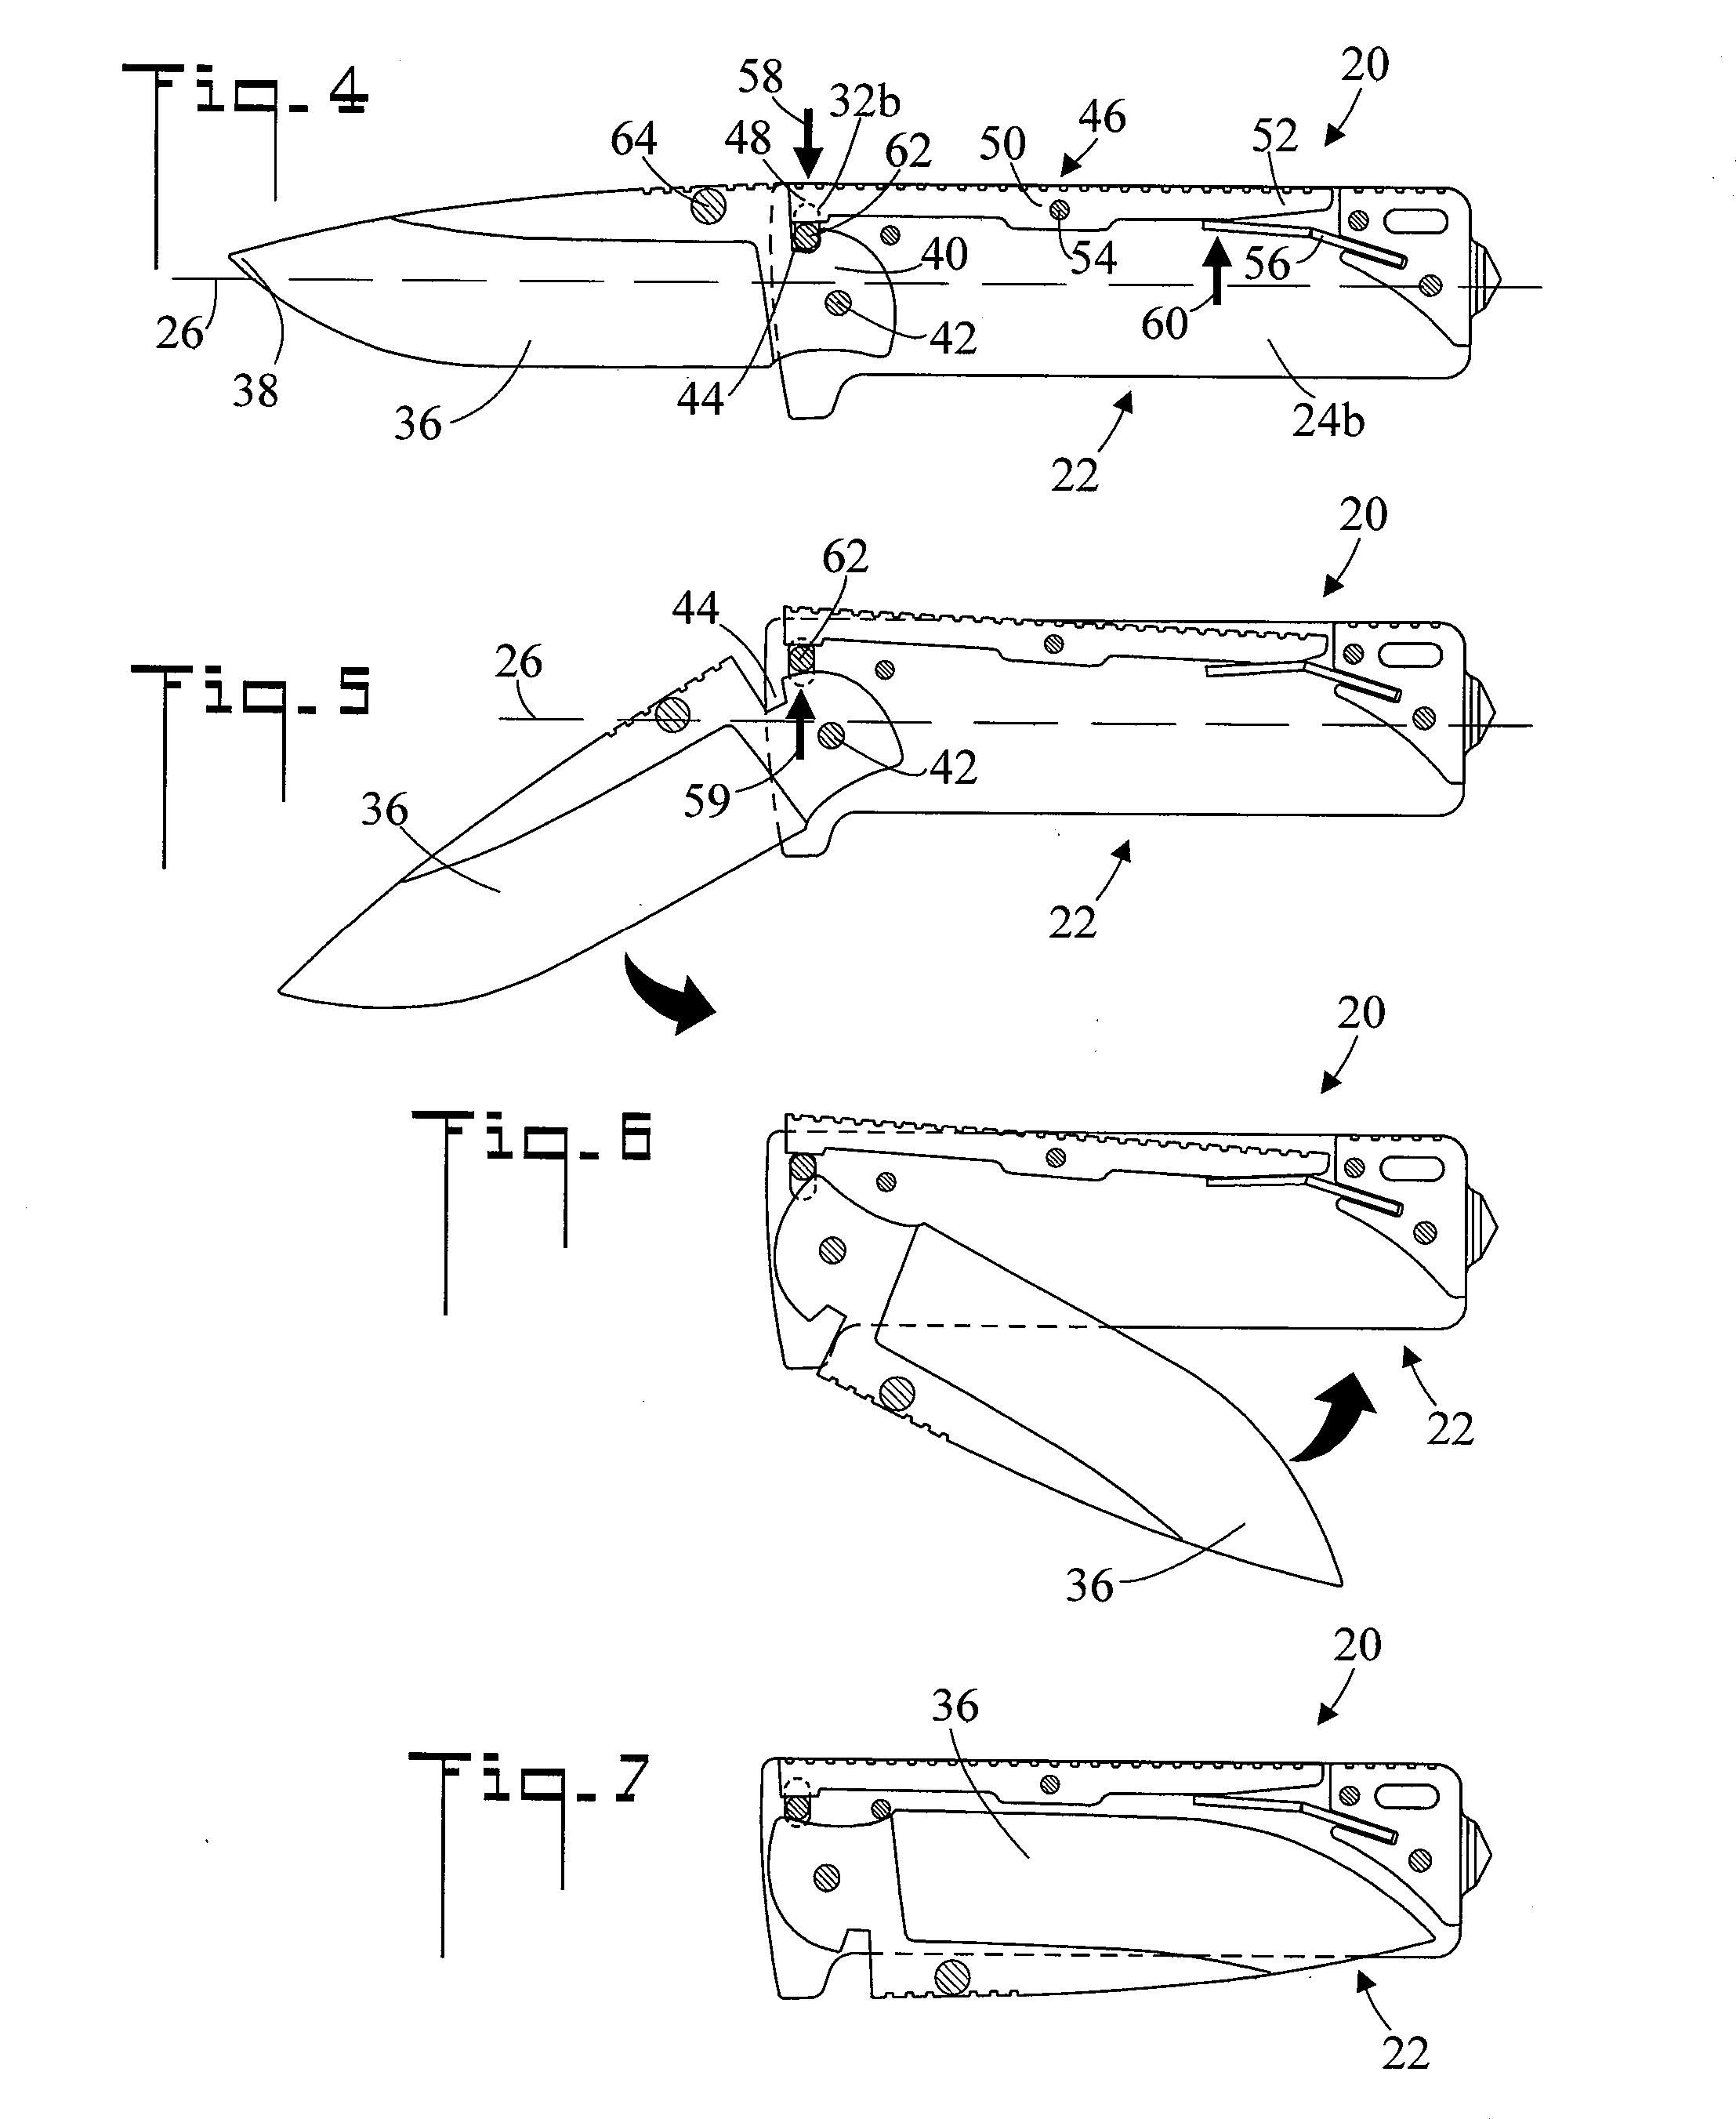 Parts Of A Pocket Knife Diagram 2002 Mitsubishi Lancer Car Radio Stereo Audio Wiring Brevet Us20130000129 Locking Mechanism For Folding